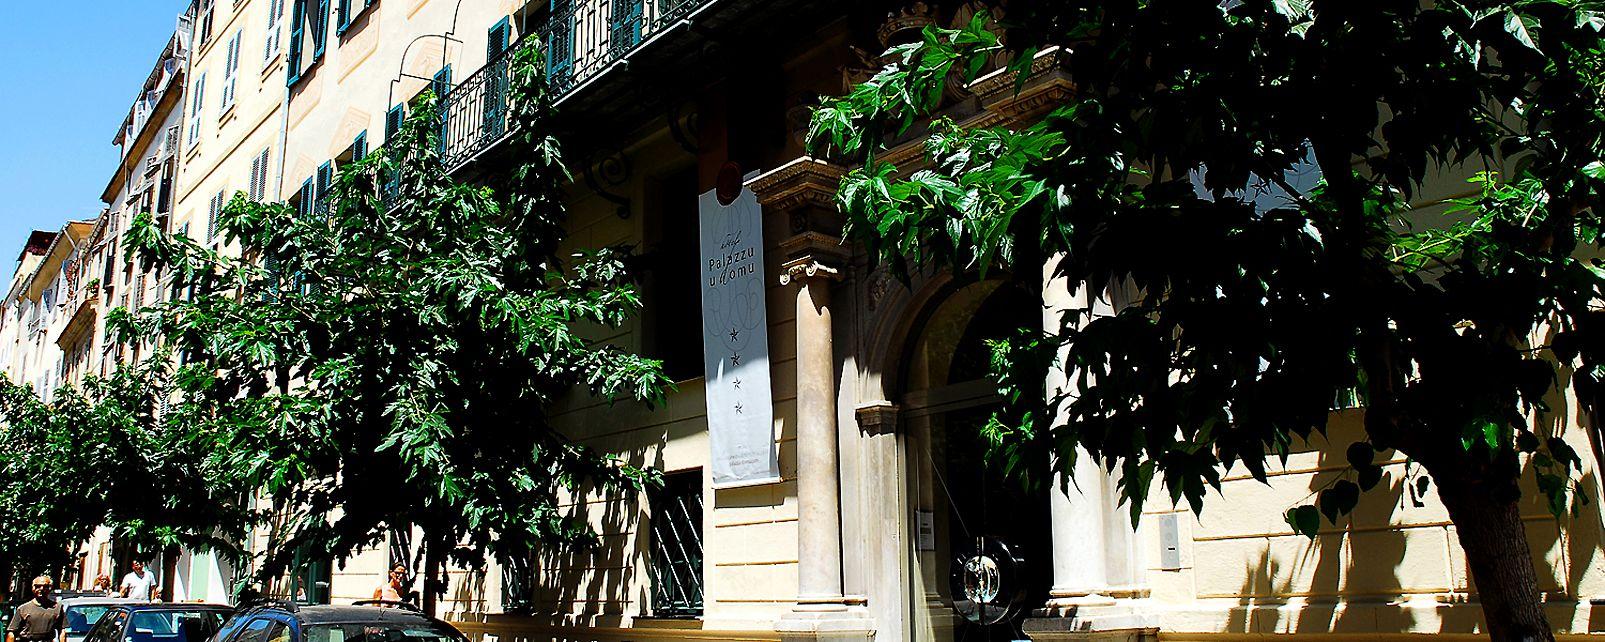 Hôtel L'Particulier Ajaccio